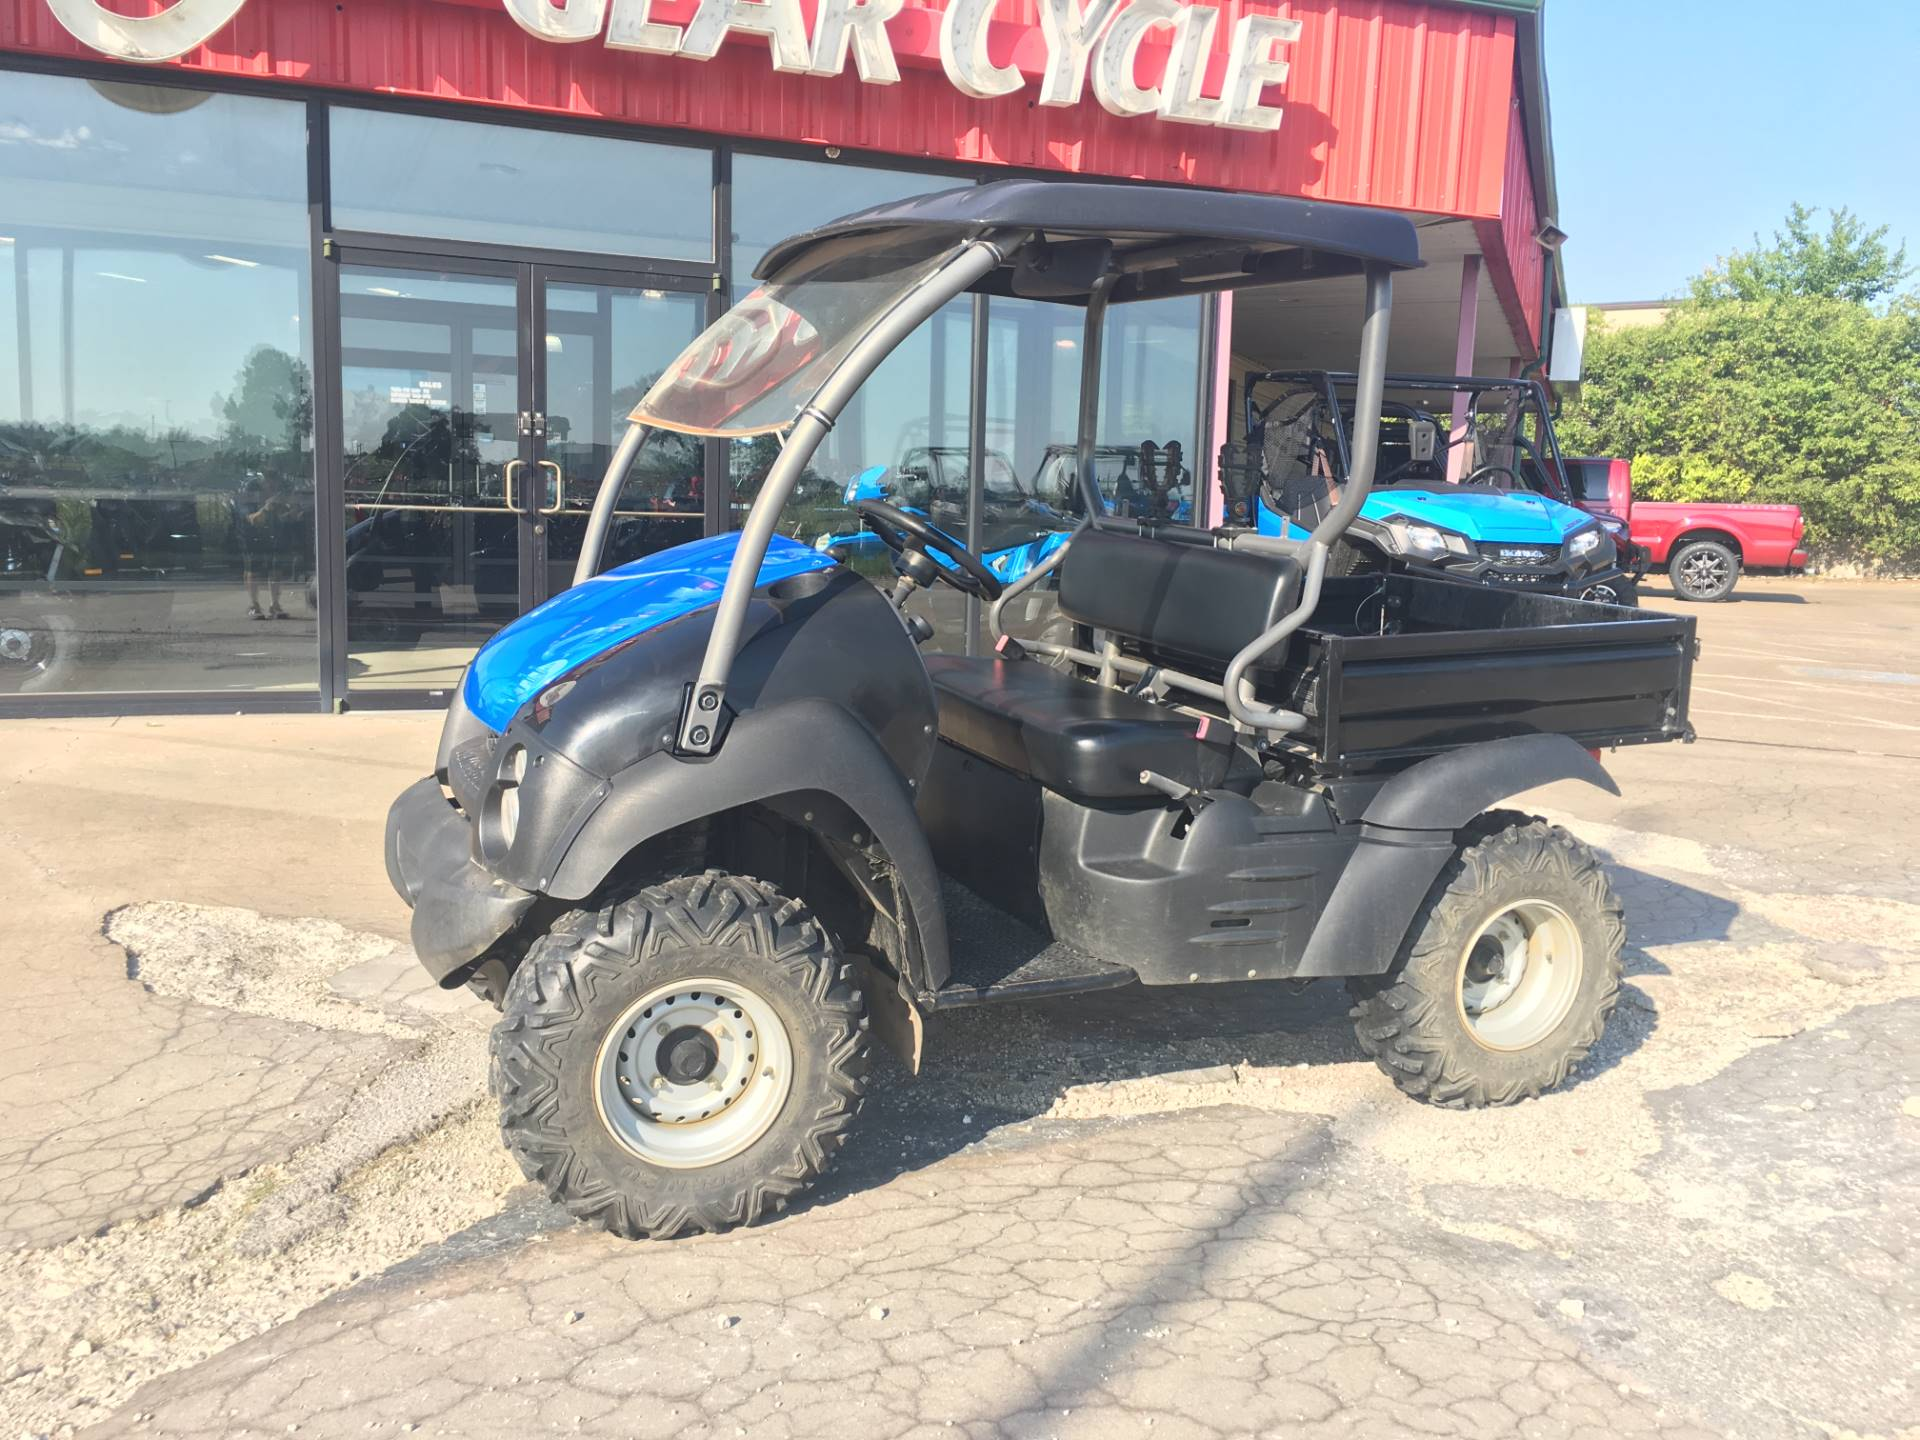 2014 Kawasaki Mule™ 610 4x4 XC in Broken Arrow, Oklahoma